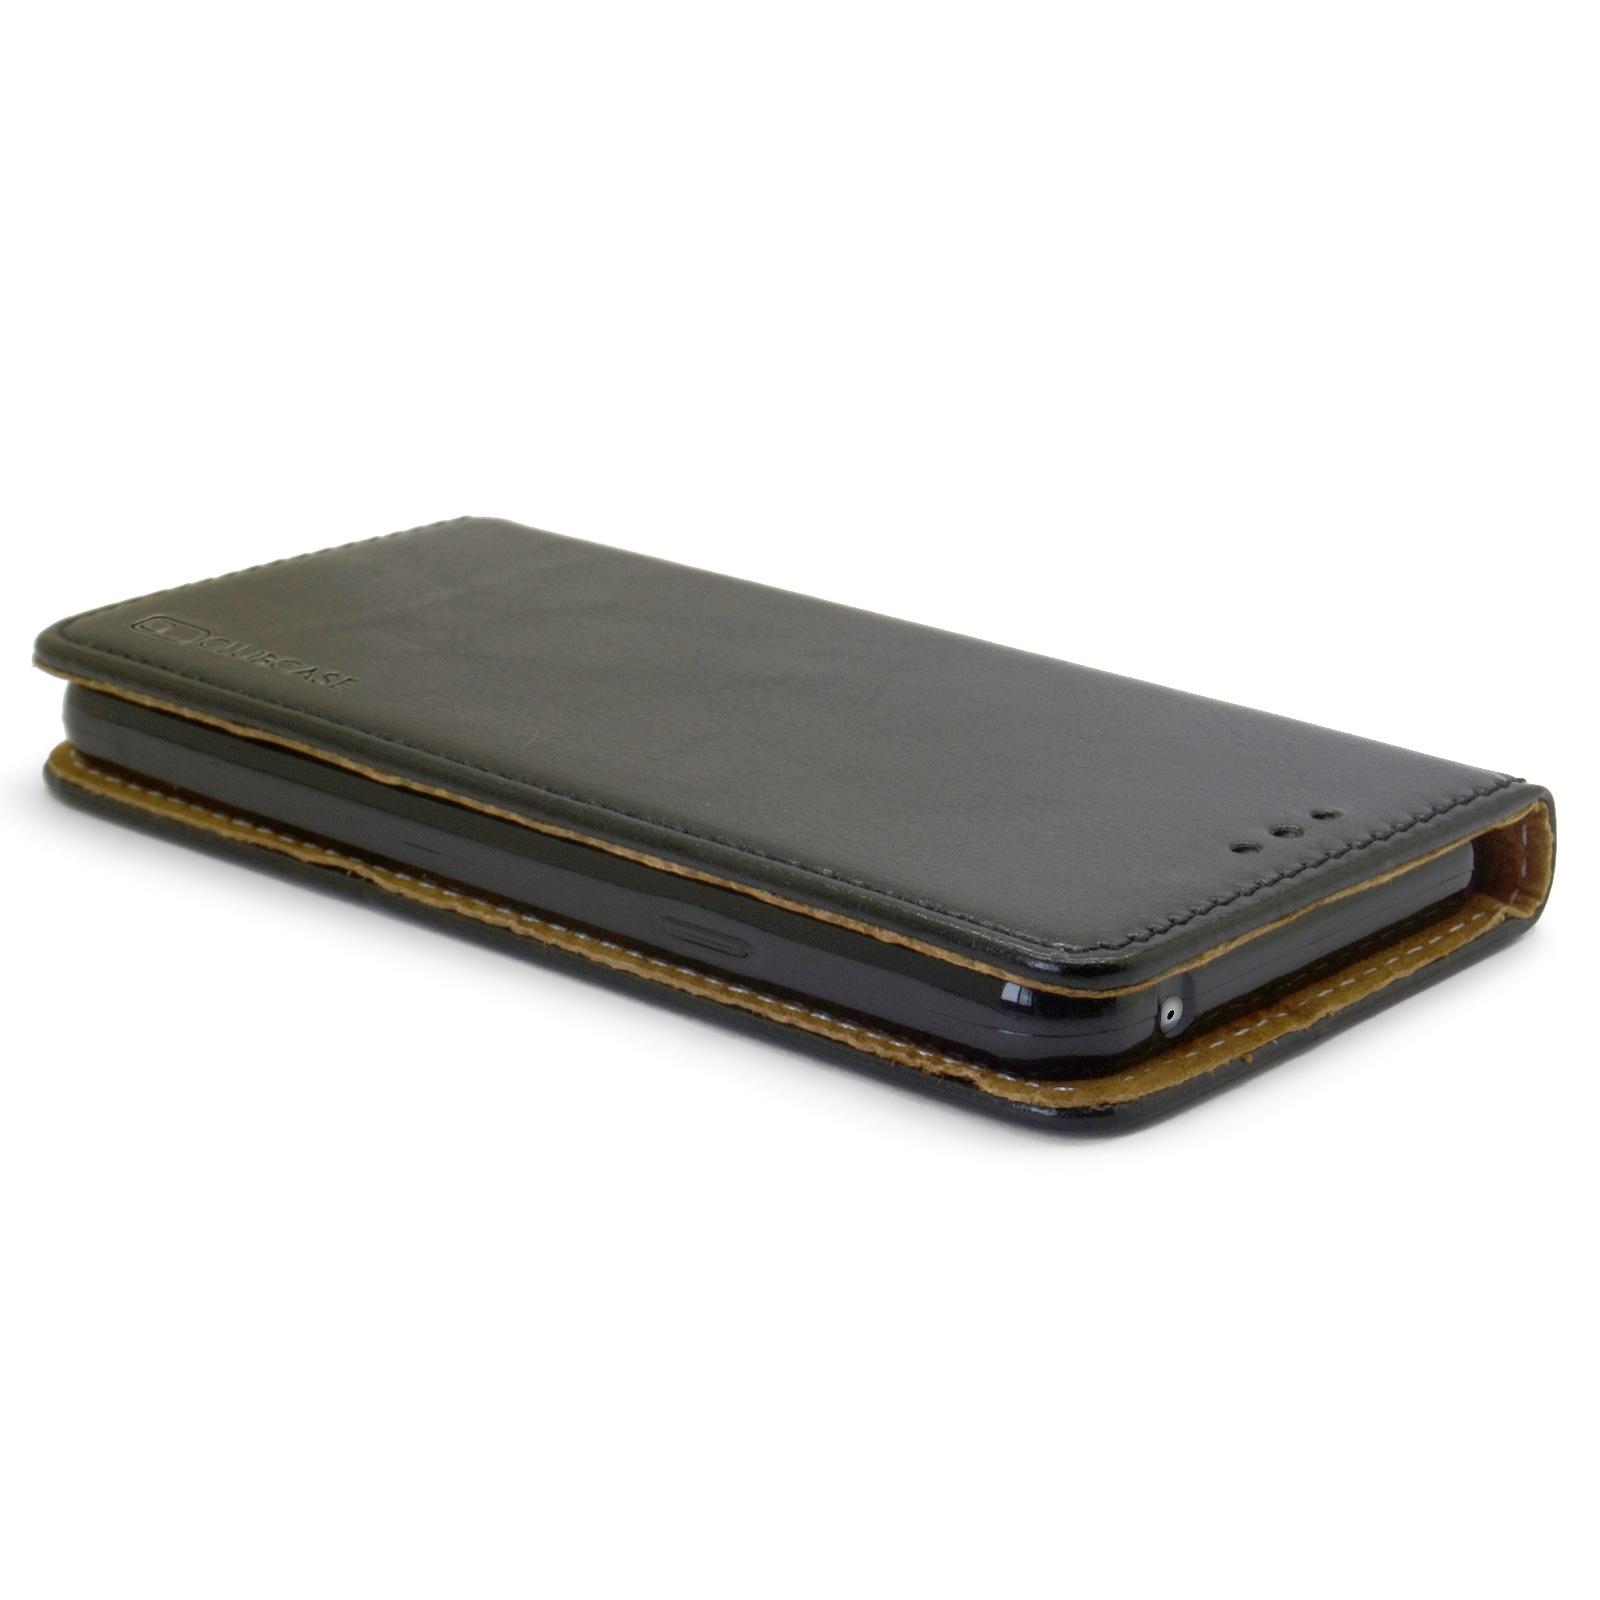 coque folio stand souple samsung galaxy a3 2016 a310 cuir v ritable noir. Black Bedroom Furniture Sets. Home Design Ideas